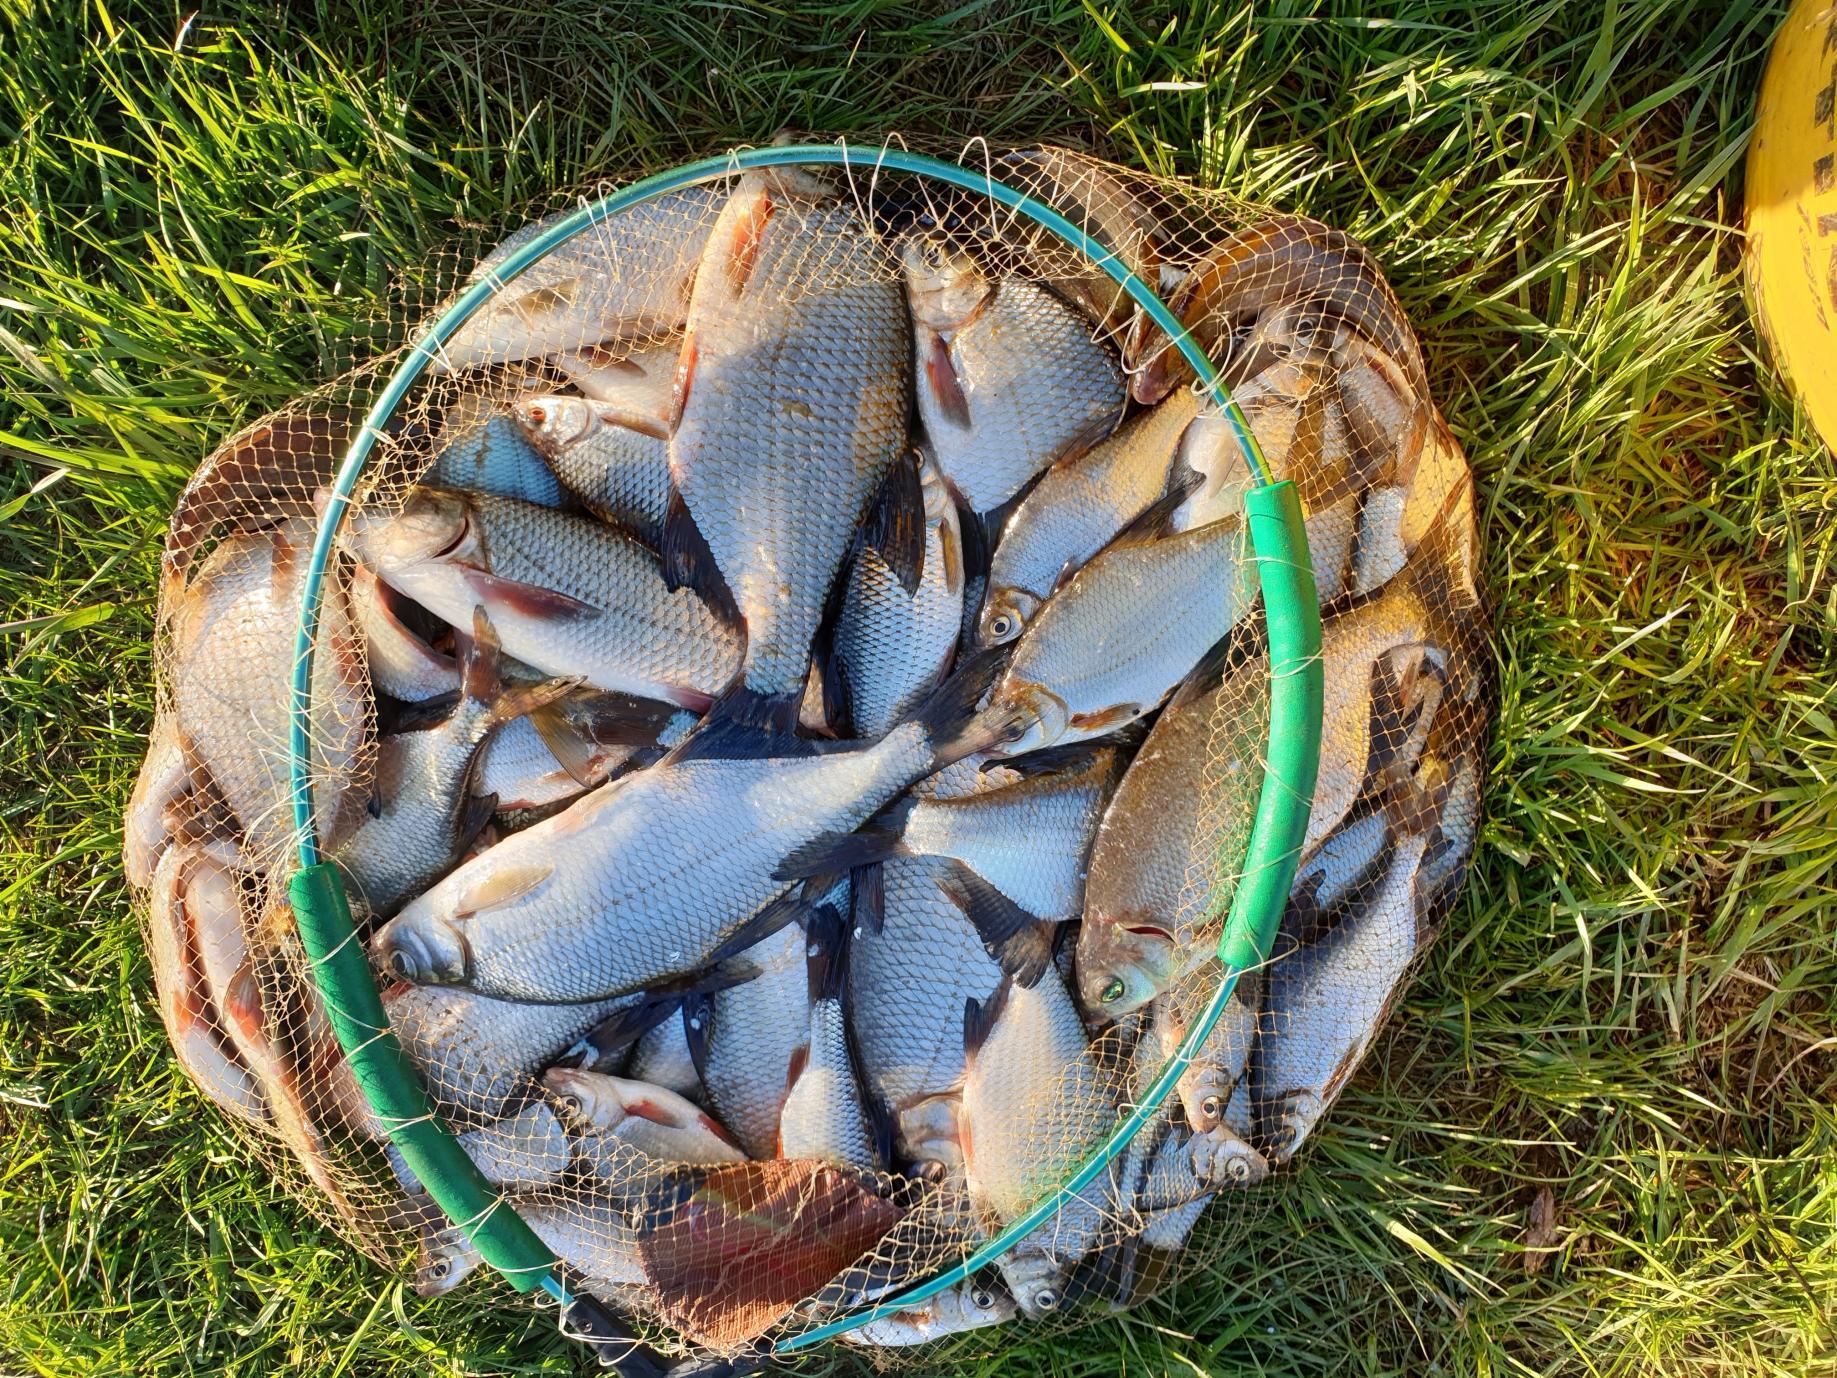 Березина – начало.Погоды последние дни стояли не по-весеннему ... | Отчеты о рыбалке в Беларуси